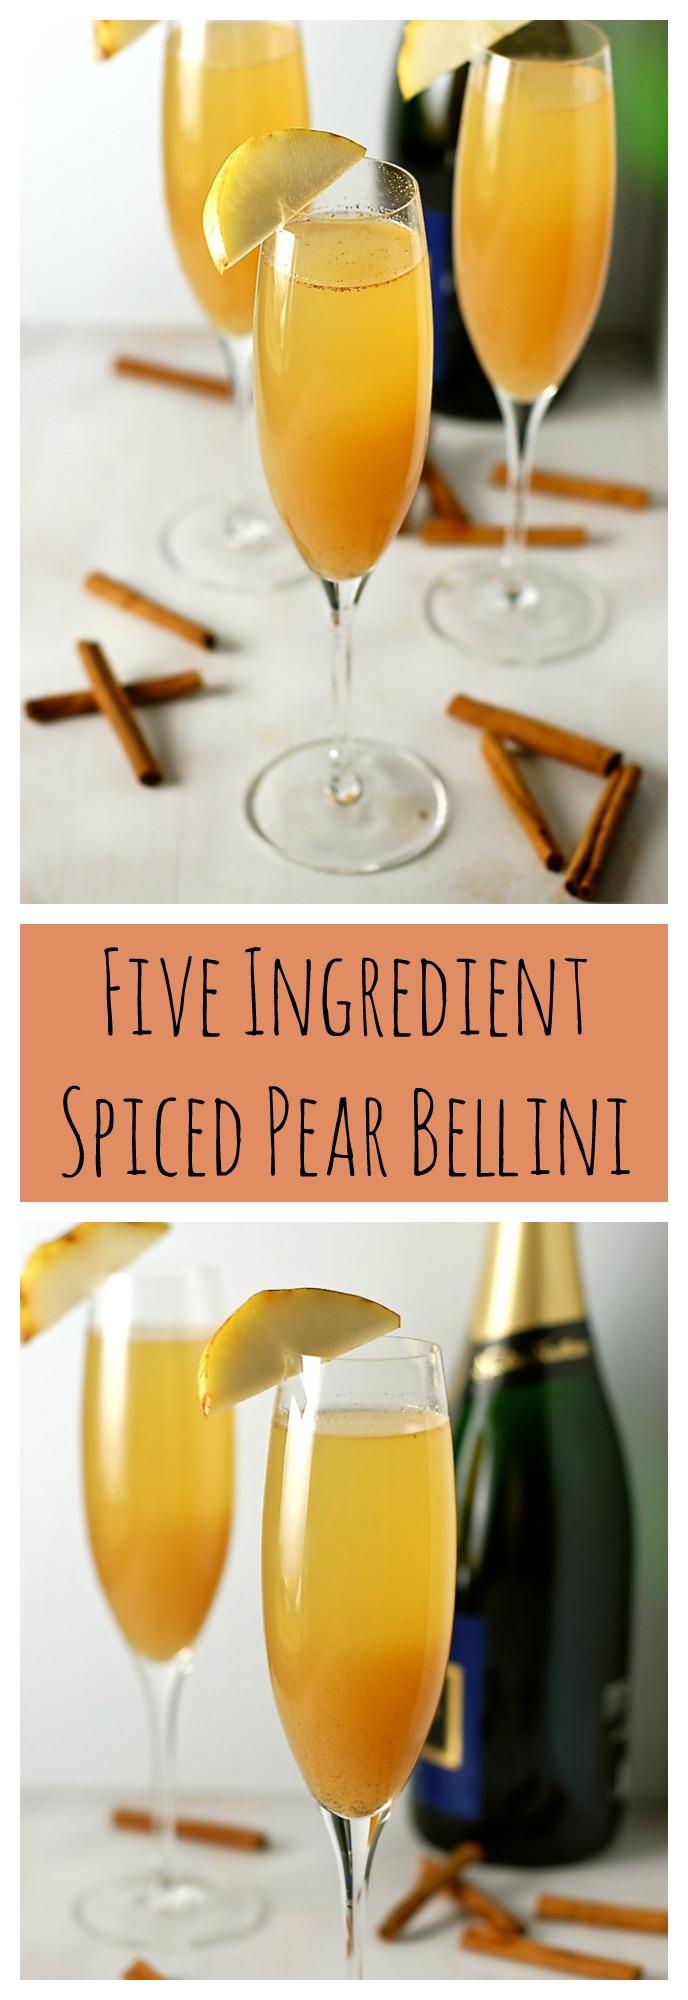 Spiced Pear Bellini